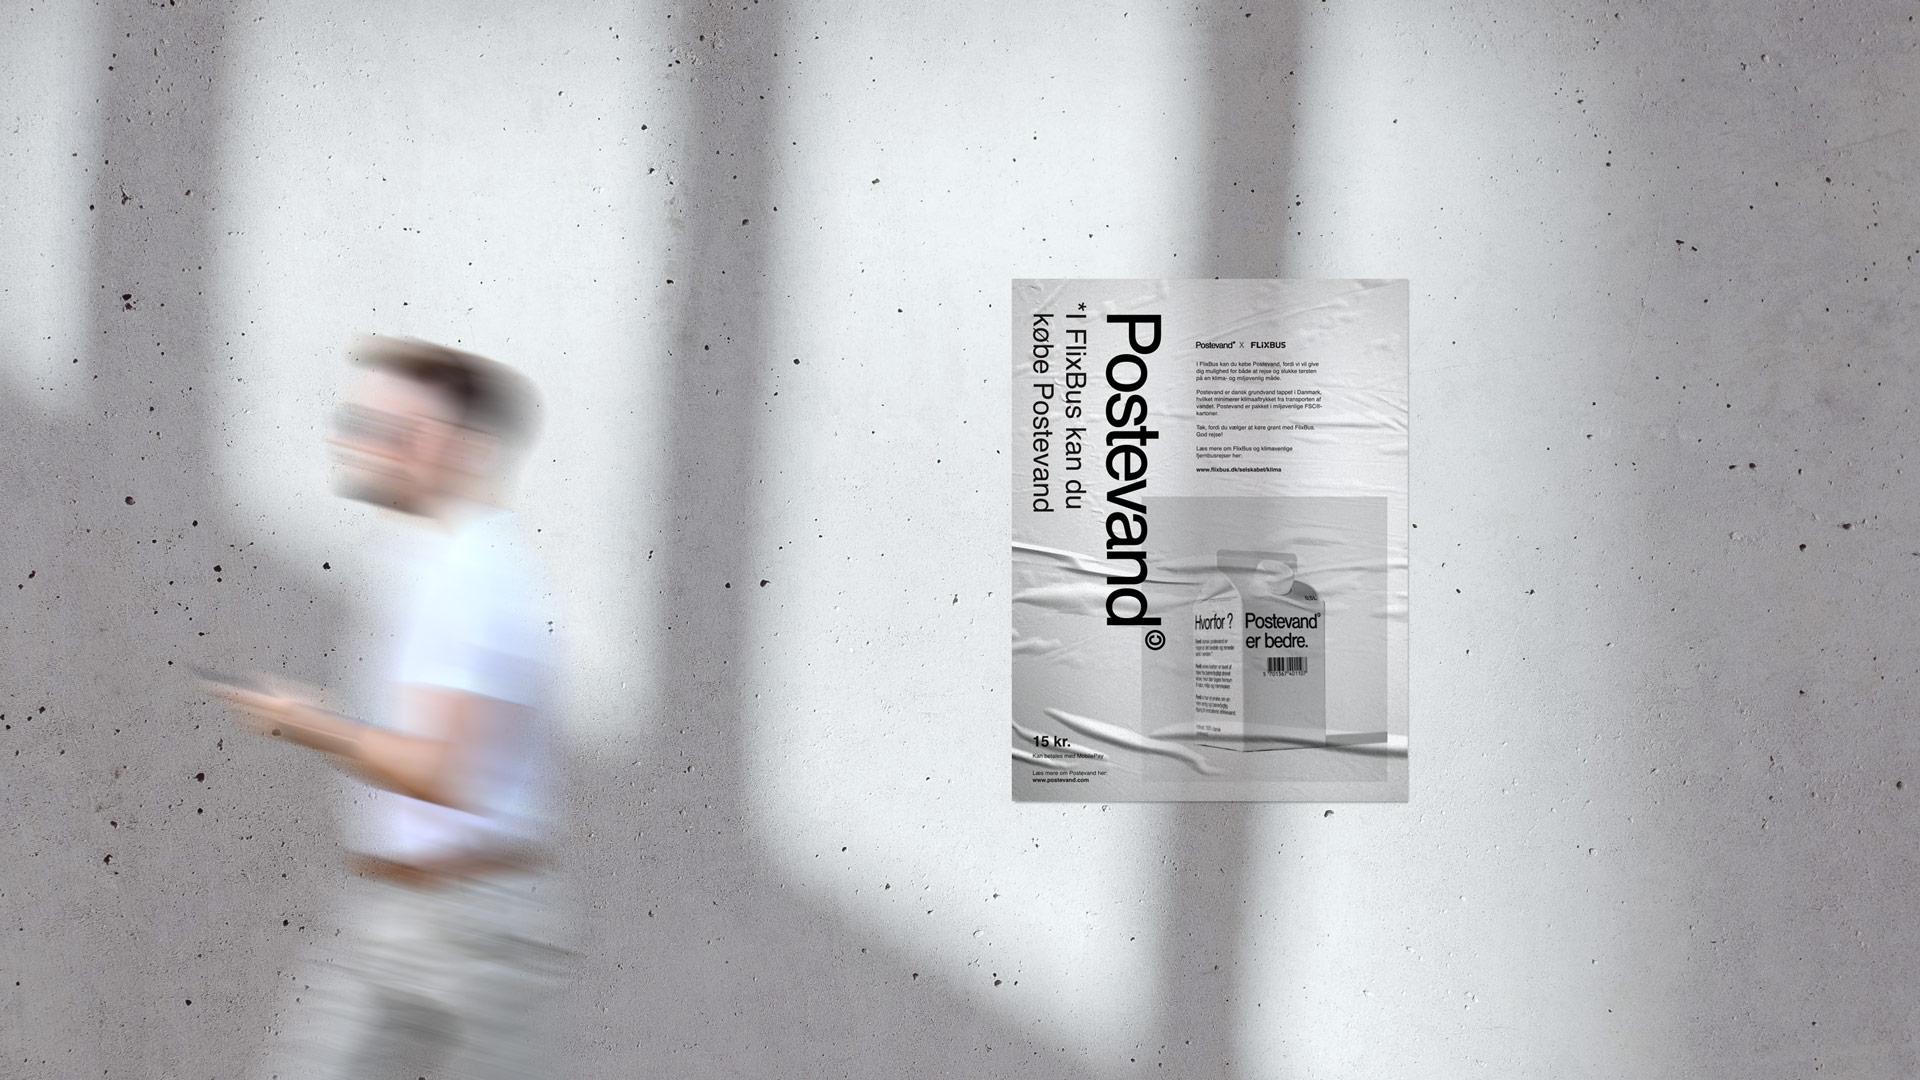 Postevand_Glued-Wall_Mockup-1